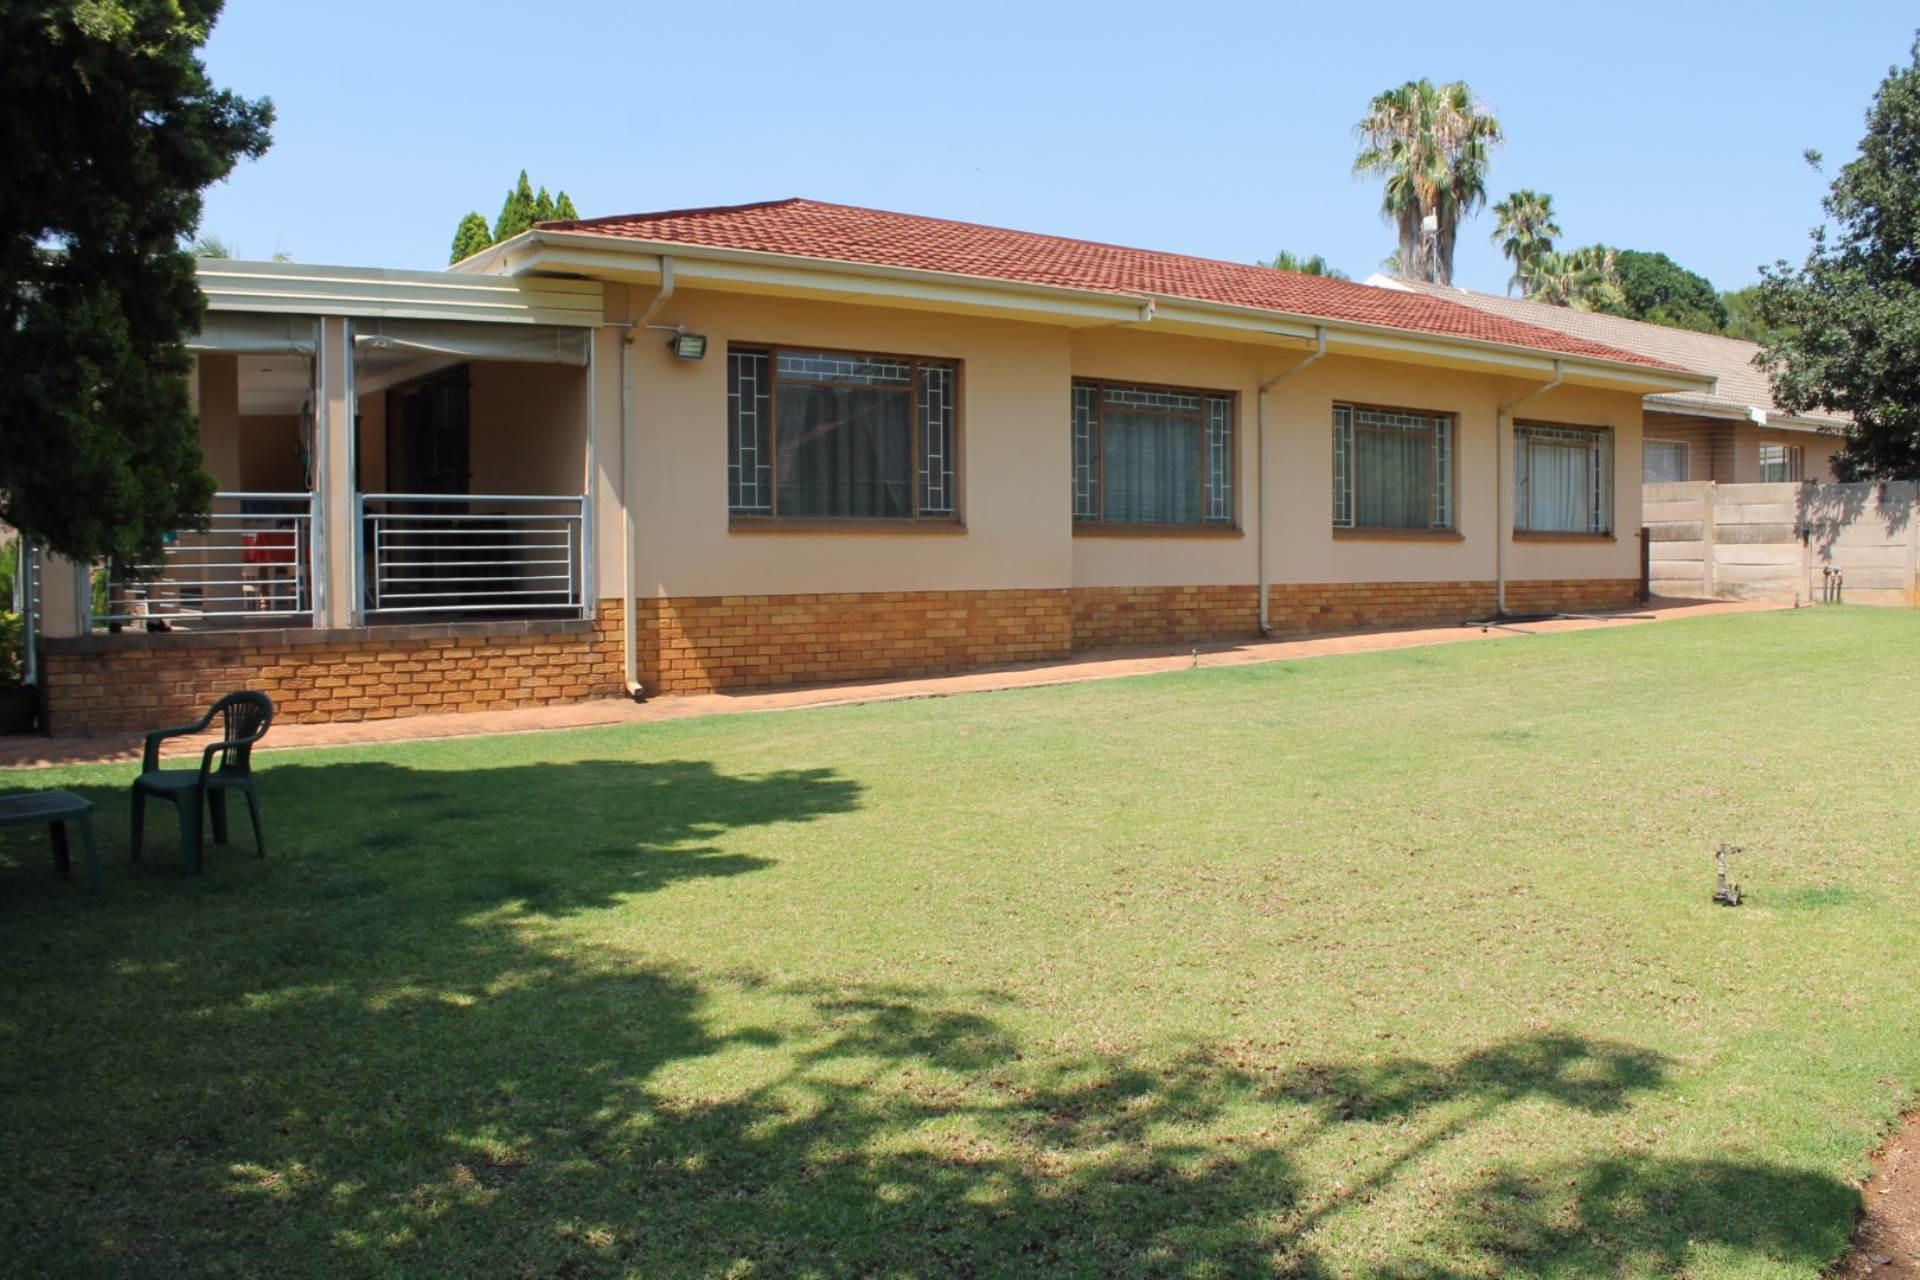 Akasia, Karenpark Property  | Houses For Sale Karenpark, KARENPARK, House 4 bedrooms property for sale Price:1,550,000